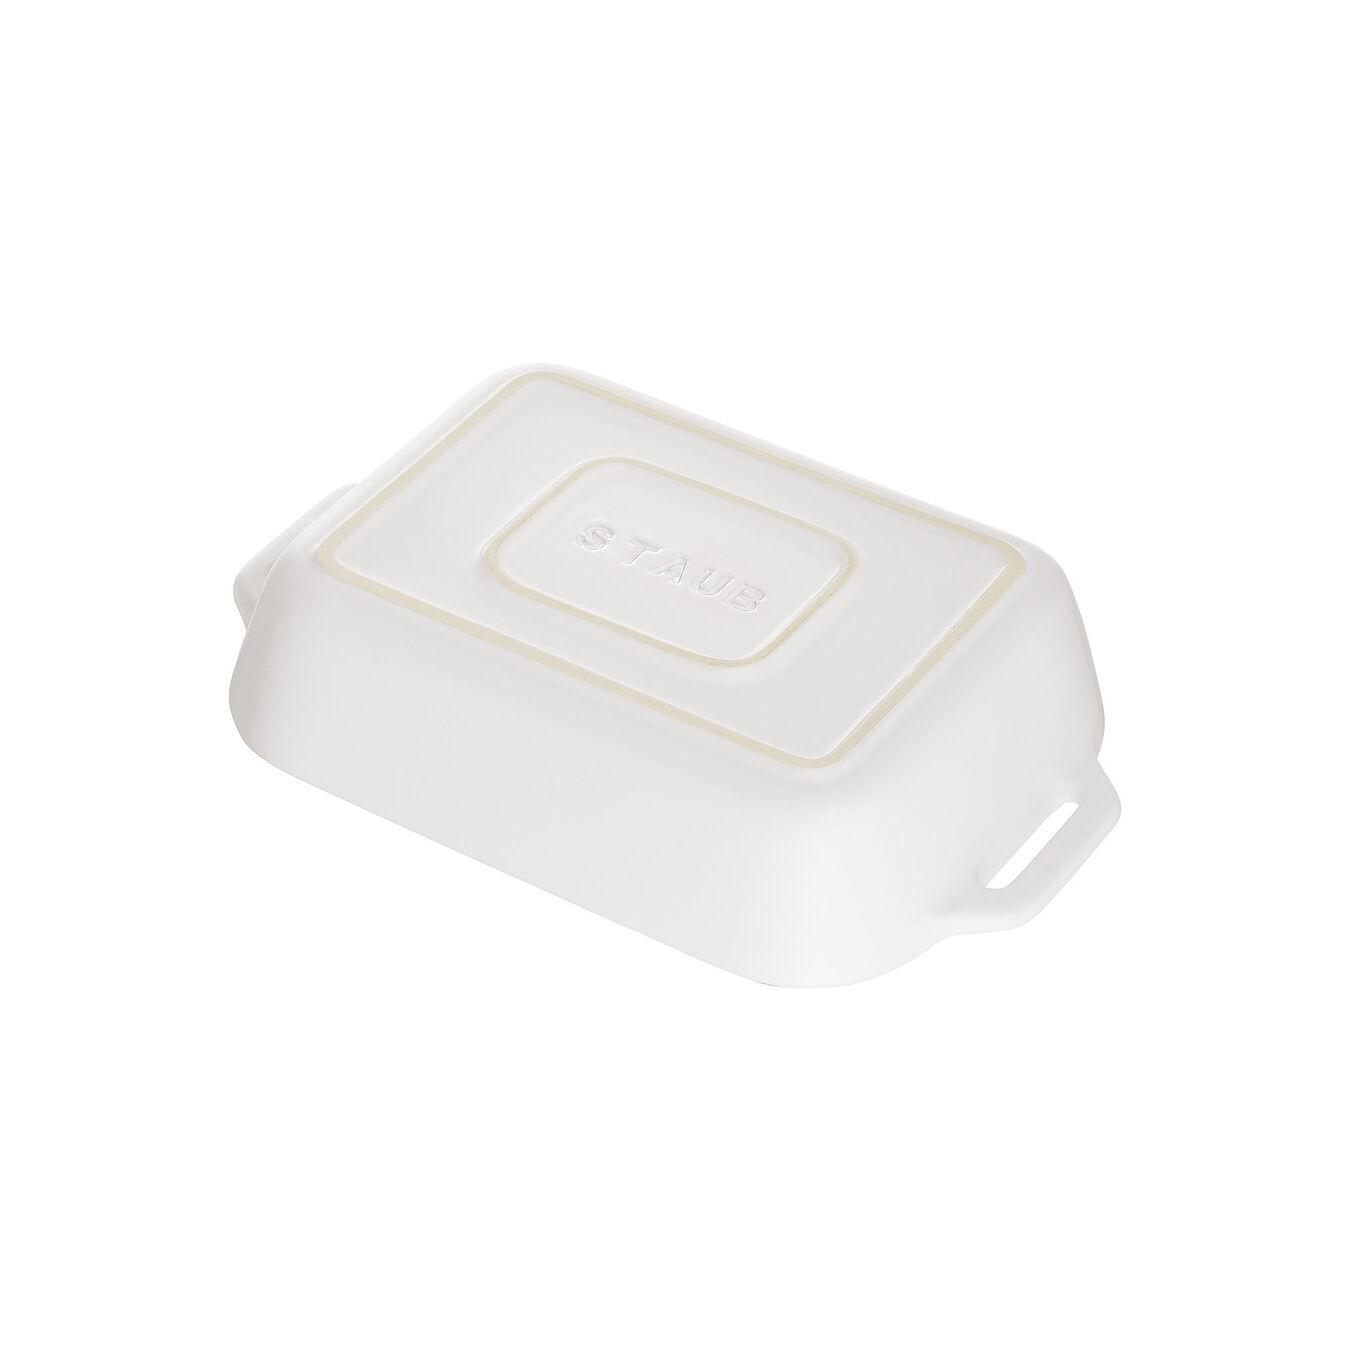 Ceramic rectangular Oven dish, Pure-White,,large 3